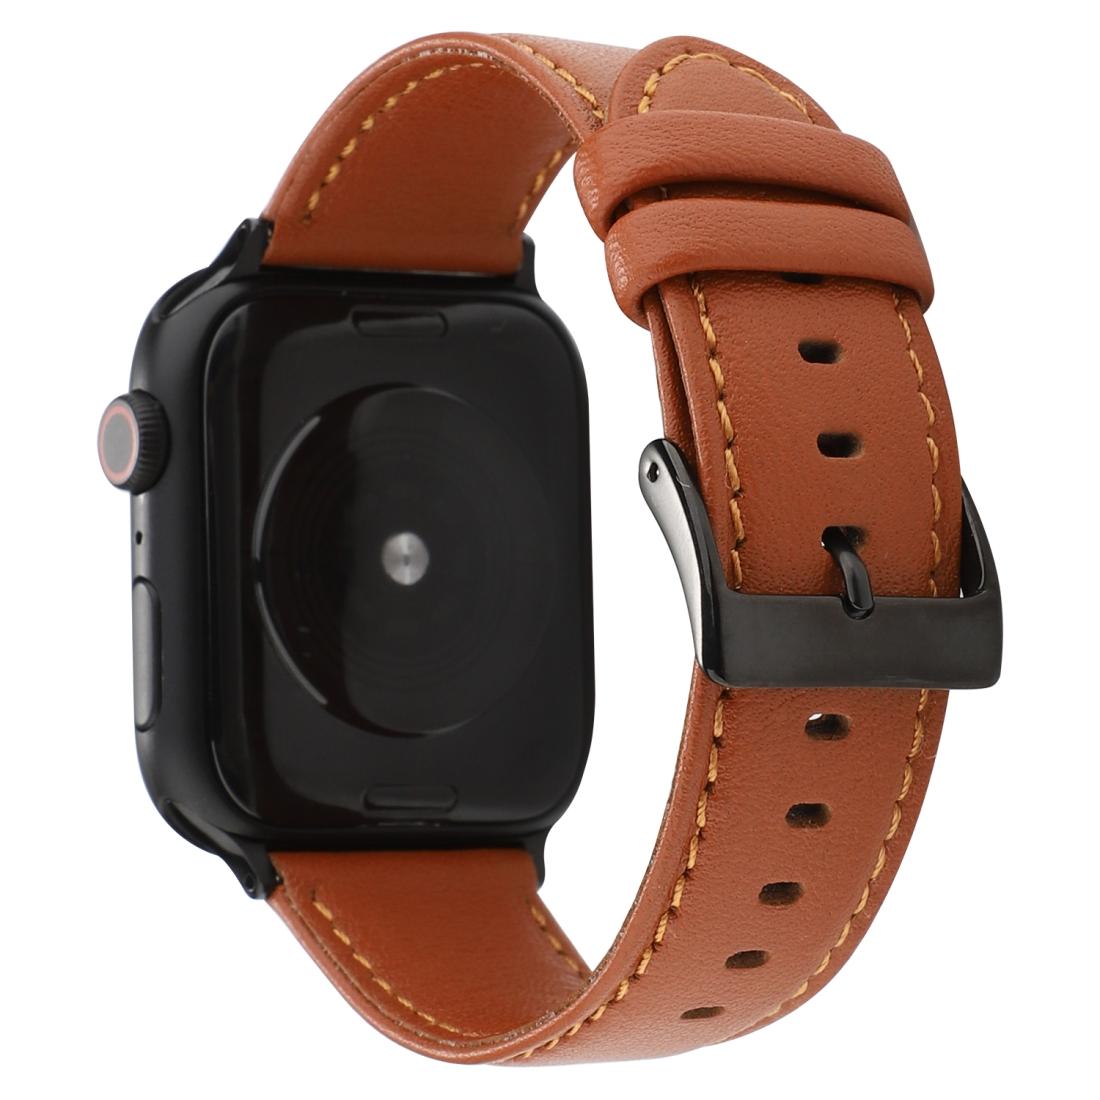 For Apple Watch Series 5 & 4 40mm / 3 & 2 & 1 38mm Cowhide ...